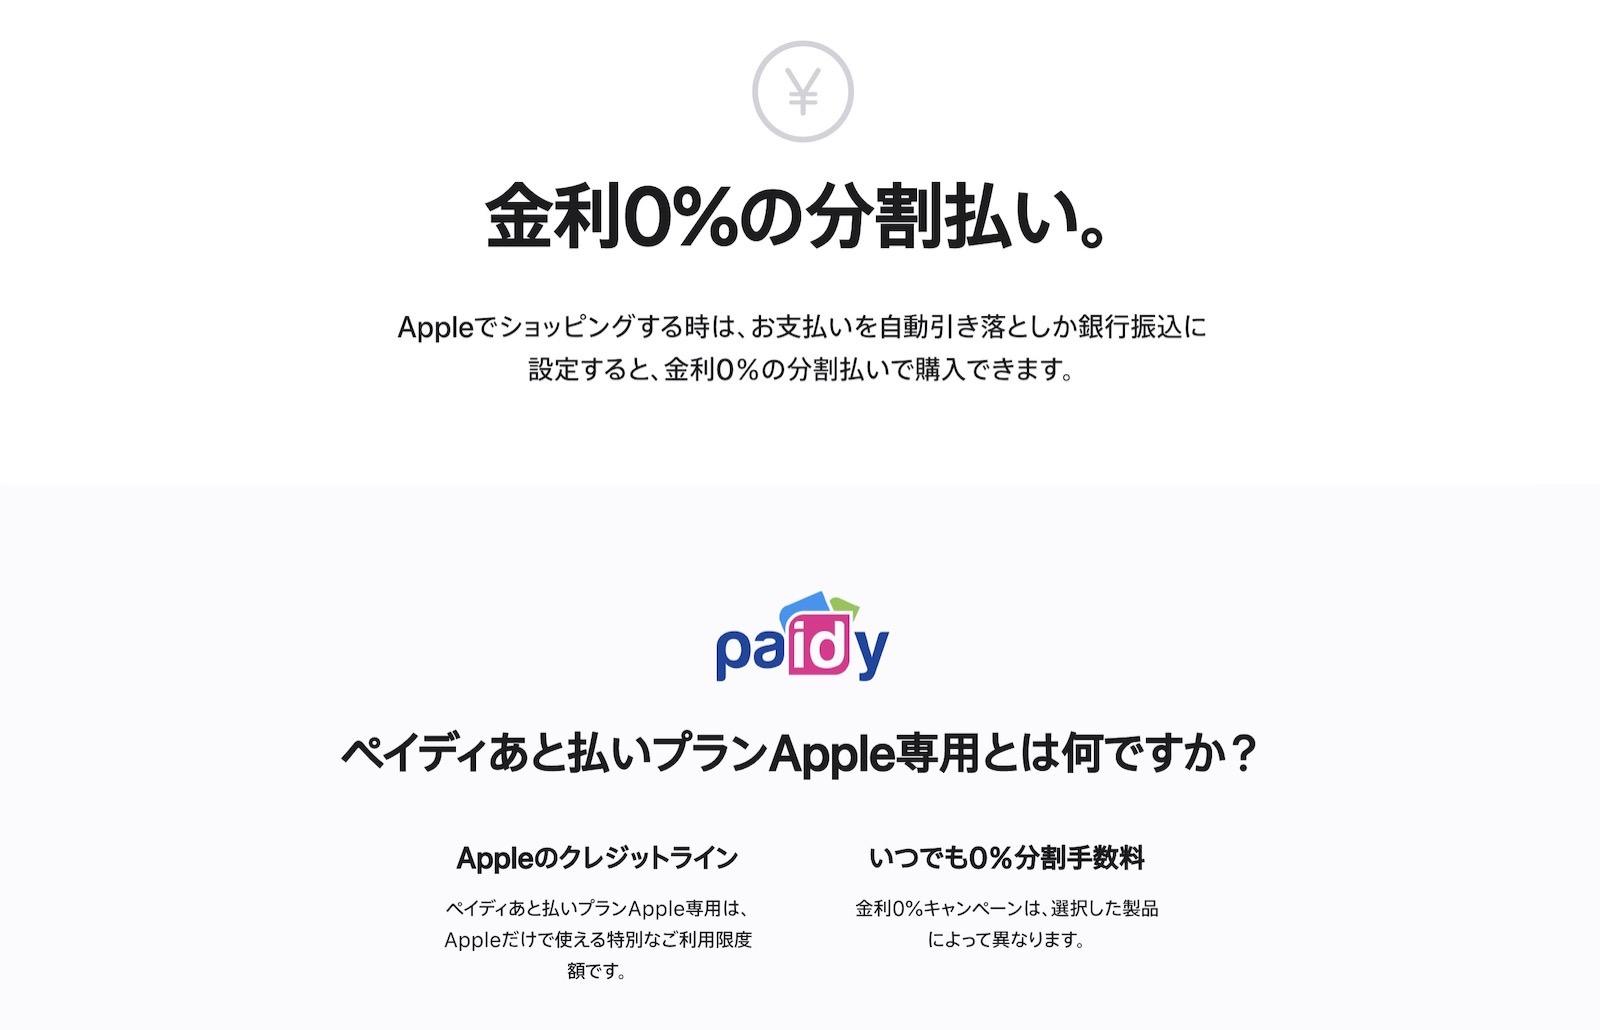 Paidy financing apple